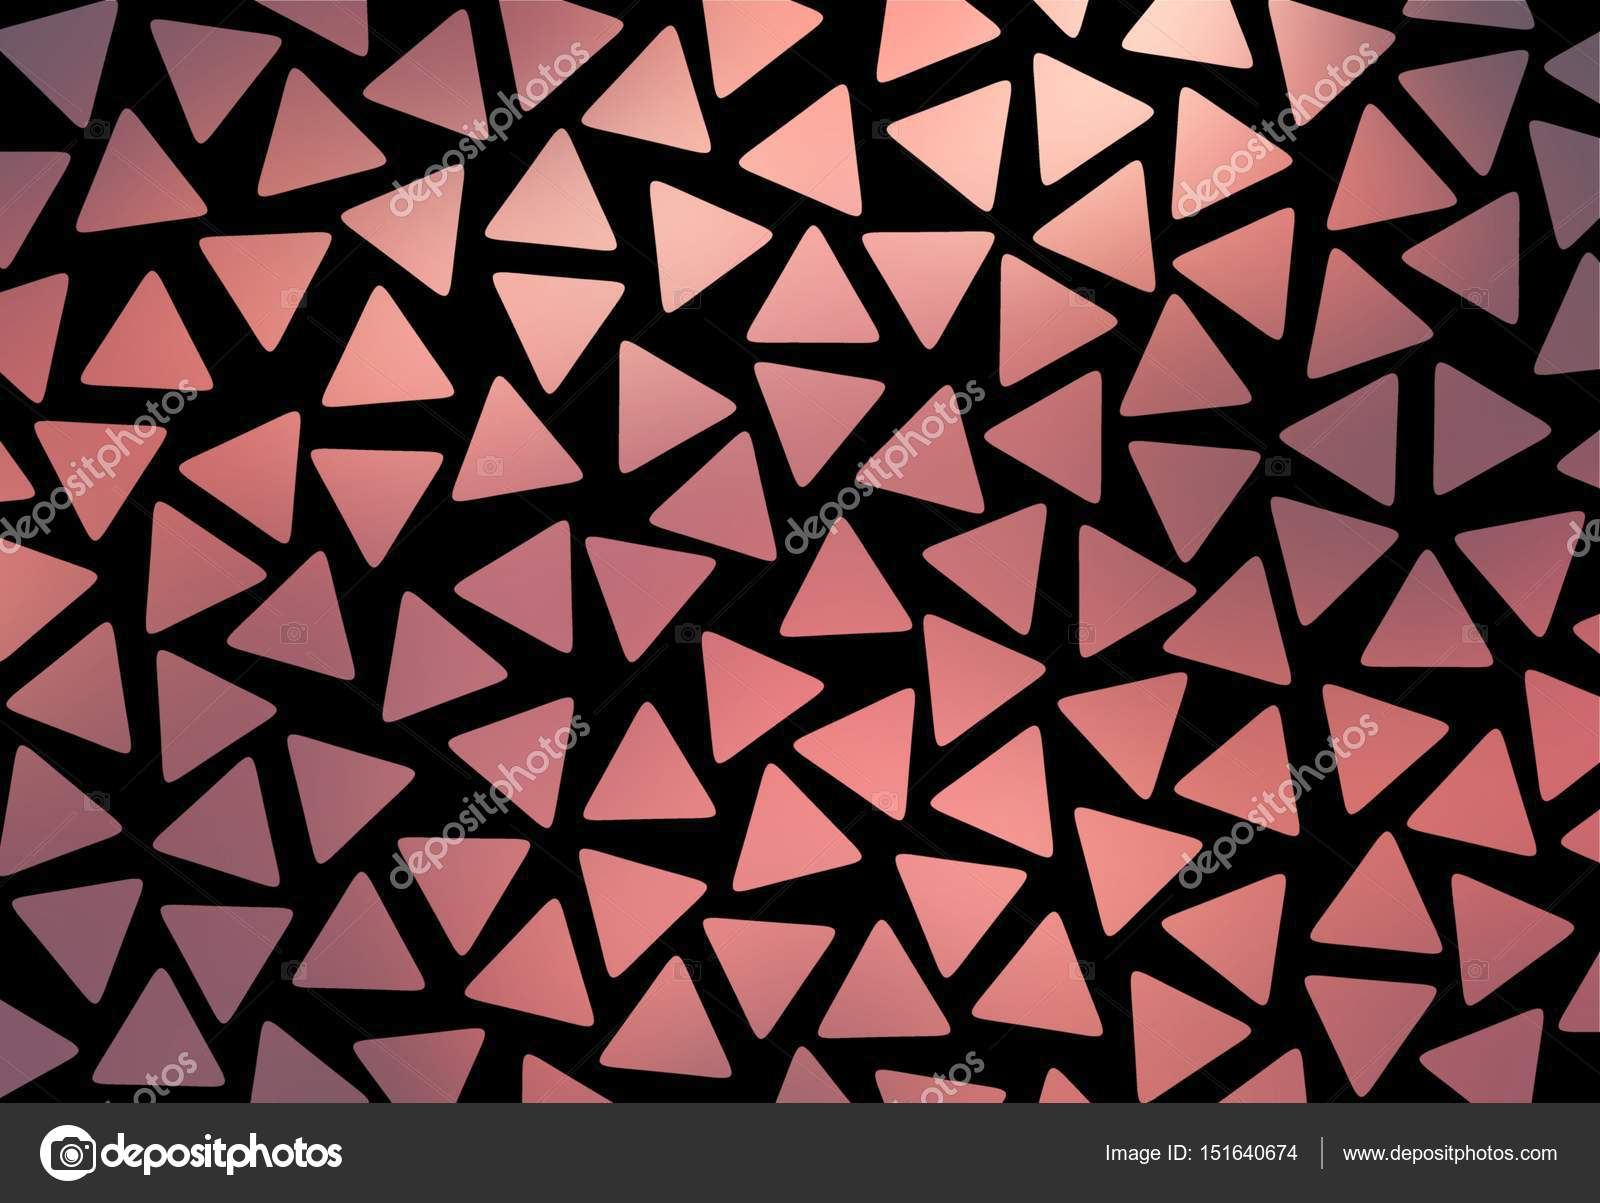 Red Shards Of Mosaic Triangular Background Shiny Geometric Pattern On A Black Wall